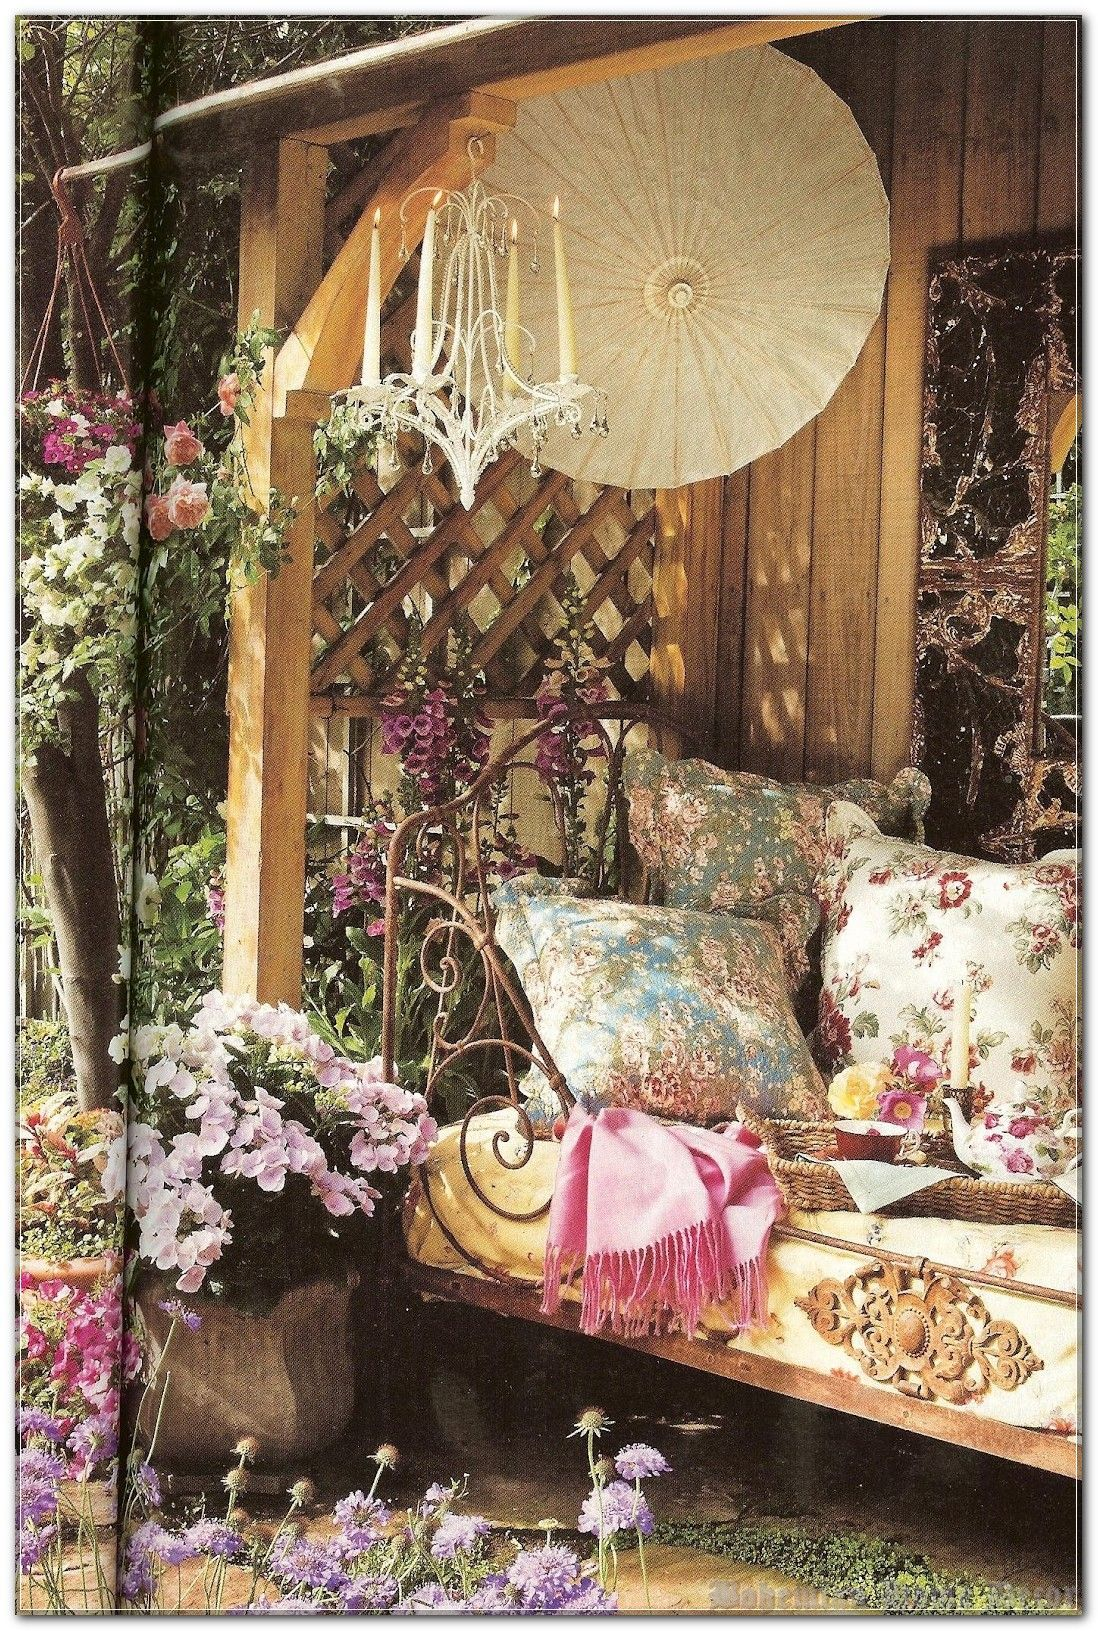 Savvy|Smart|Besty People Do Bohemian Home Decor :)